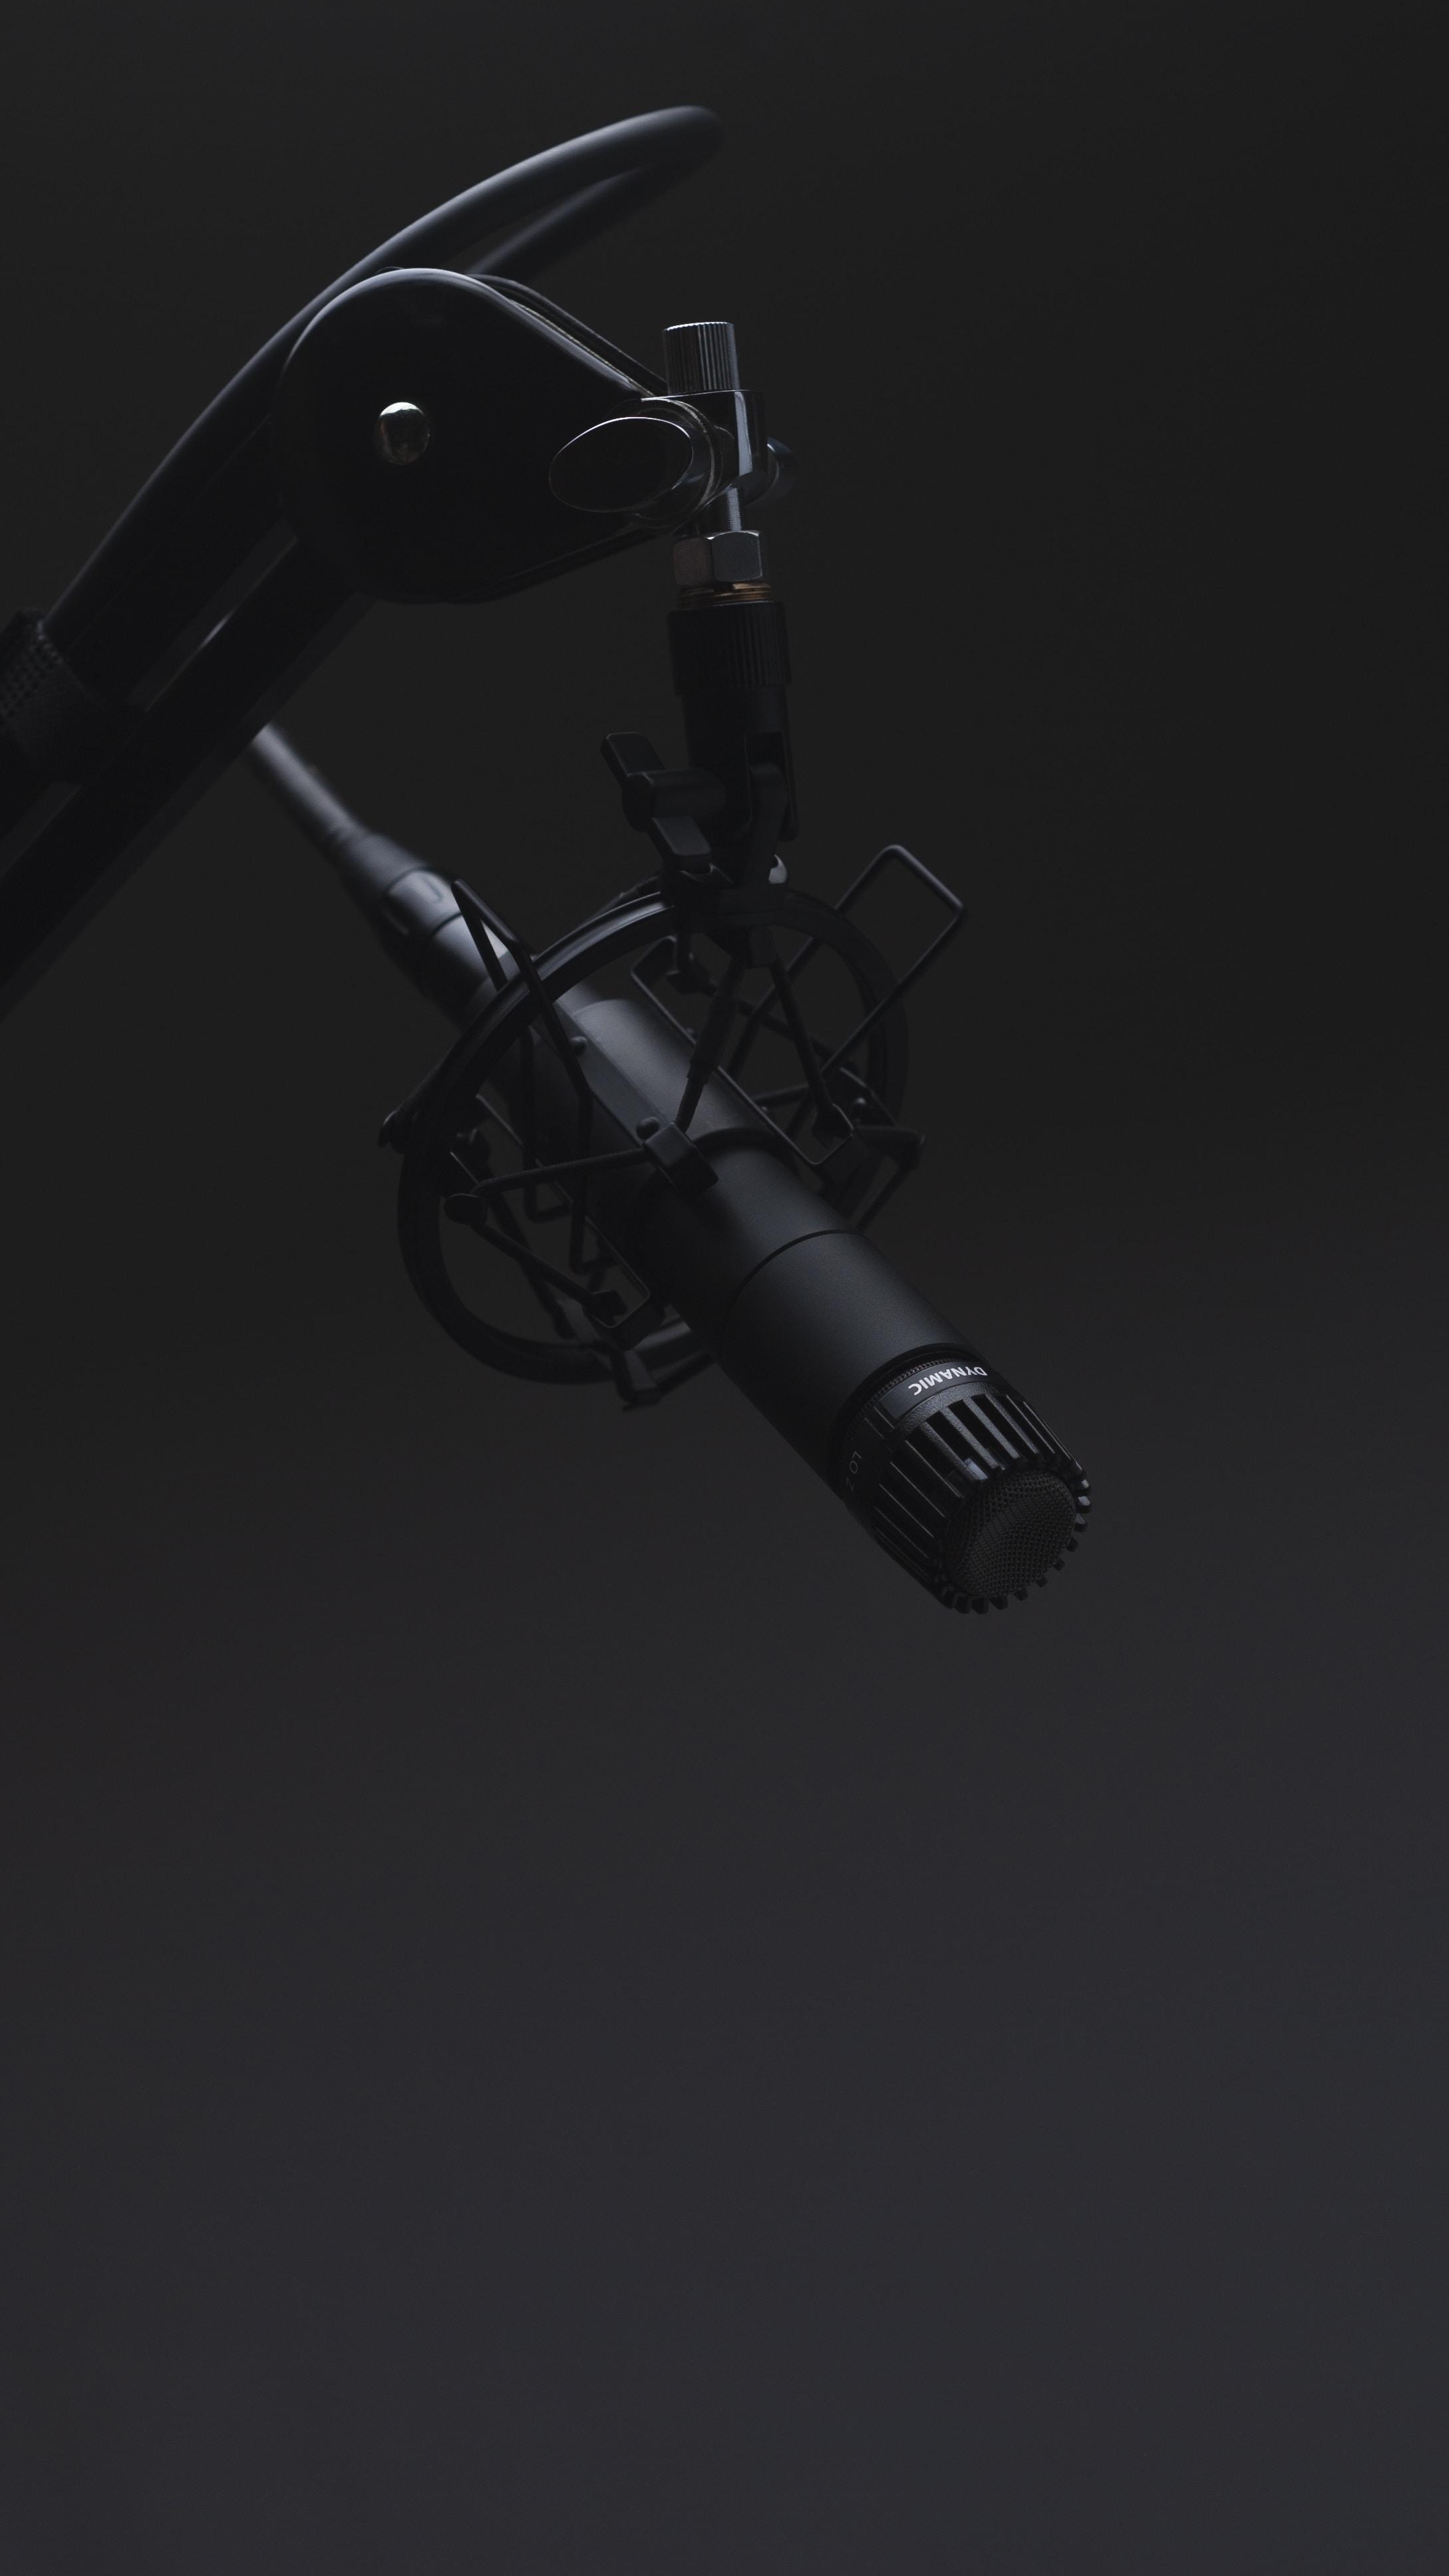 black microphone in dimmed room